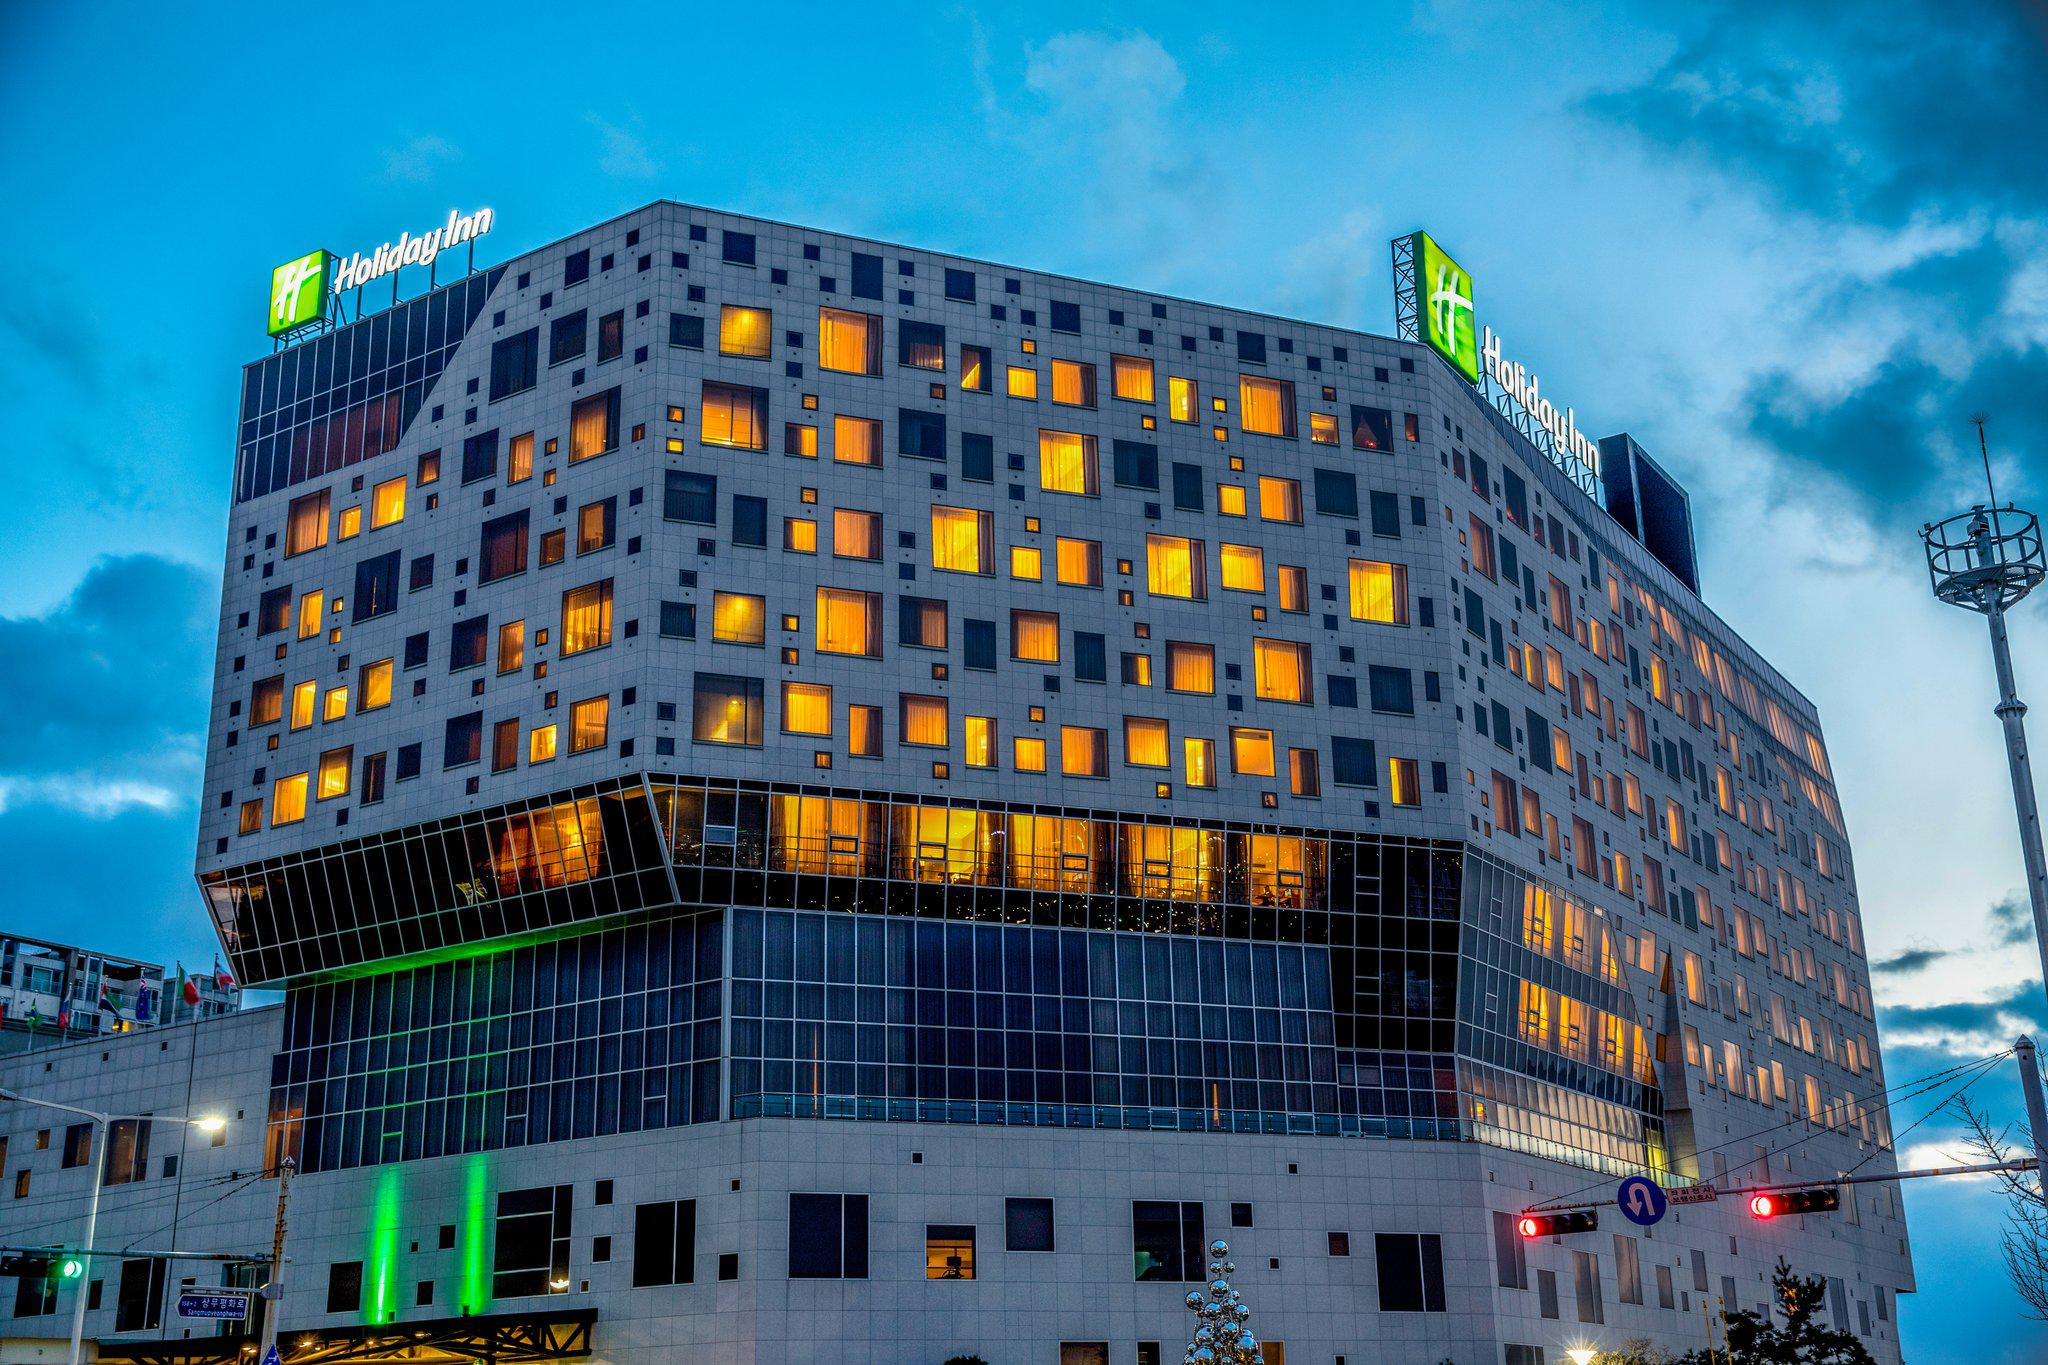 Holiday Inn Gwangju, Korea, an IHG Hotel